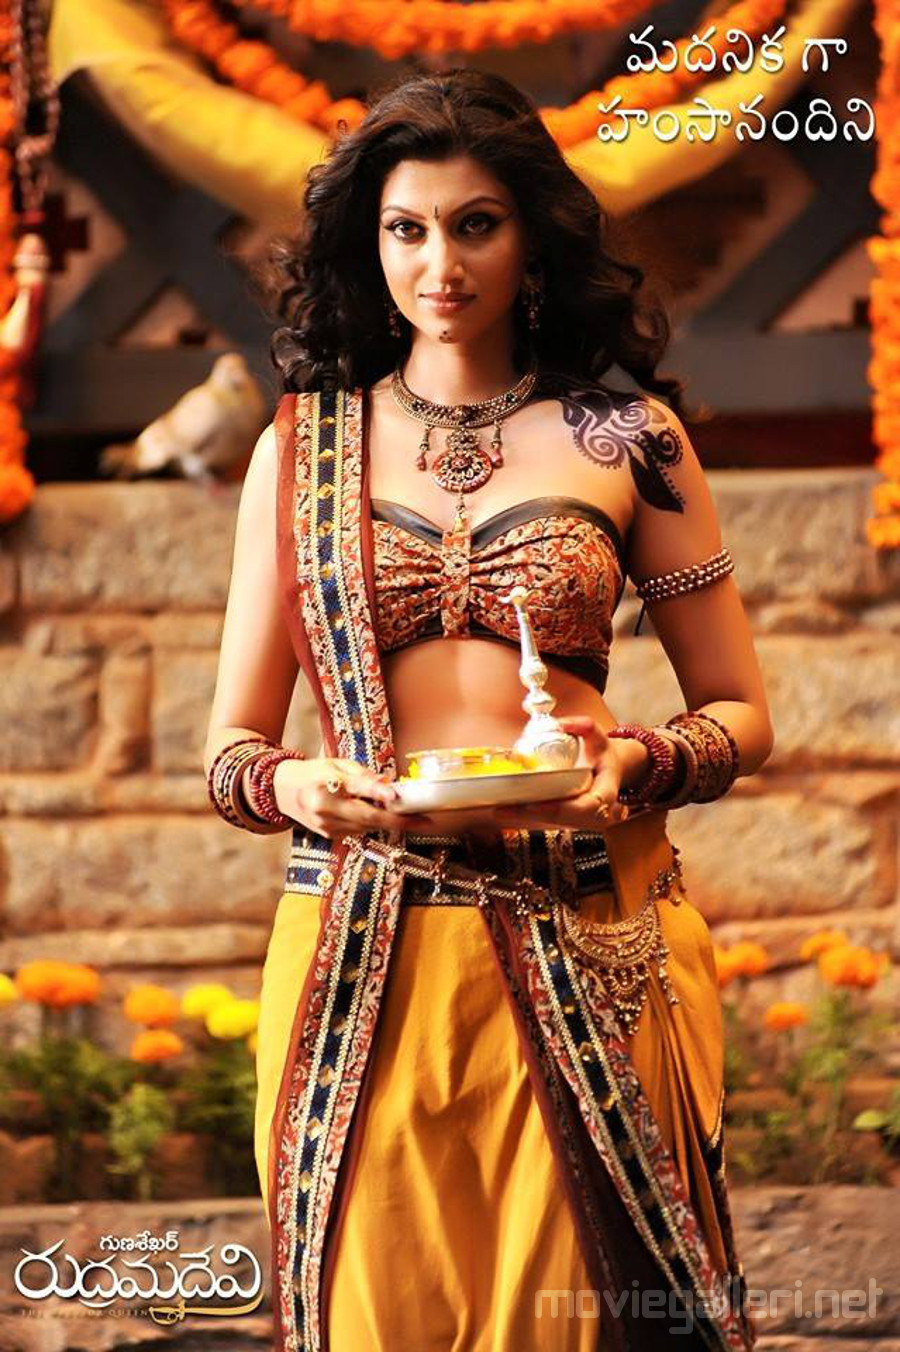 Telugu Actress Hamsa Nandini as Madhanika in Rudramadevi Movie.